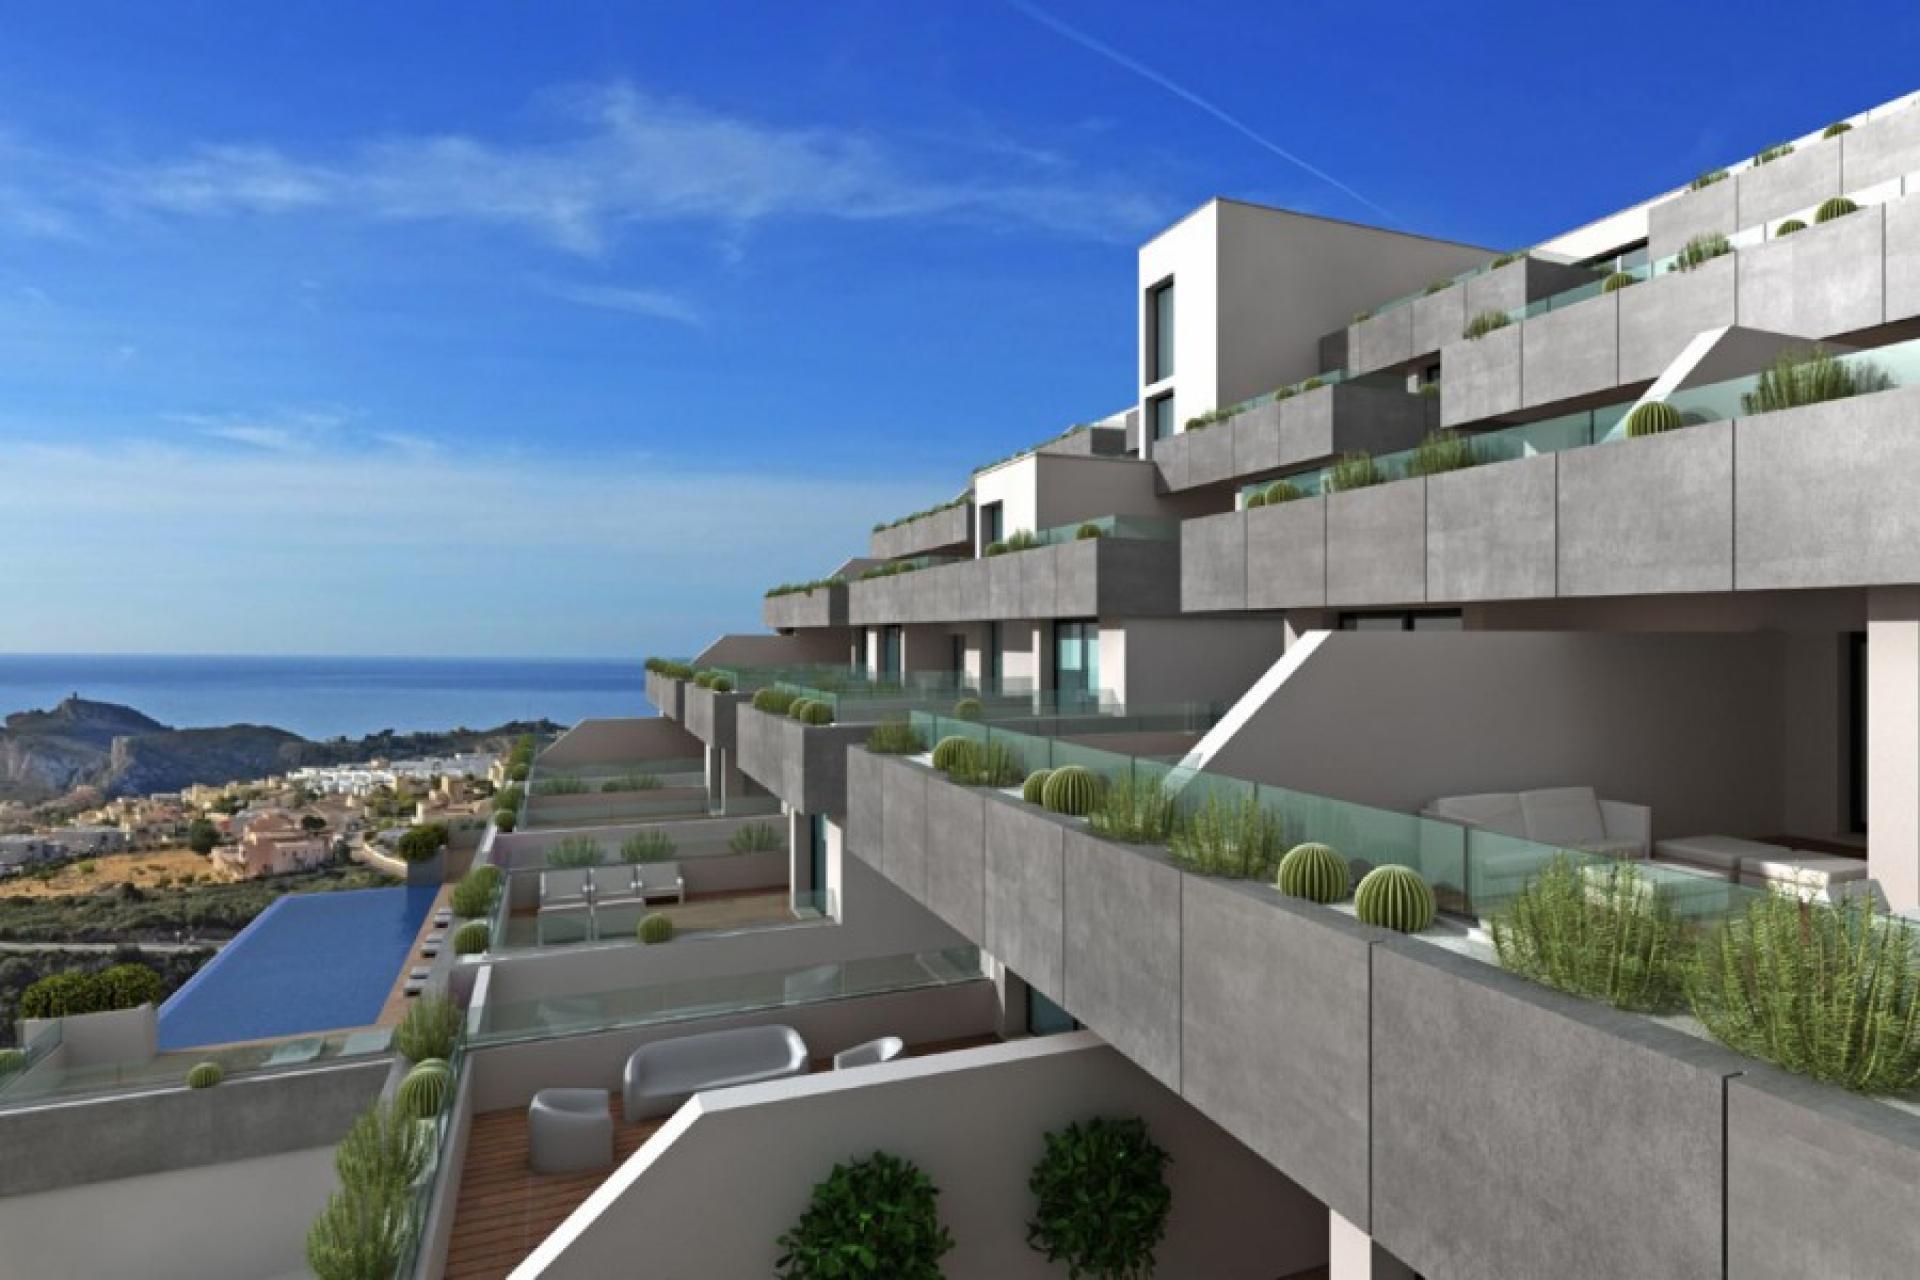 Appartement Cumbre del Sol Costa Blanca Noord Spanje in Immo Spanje